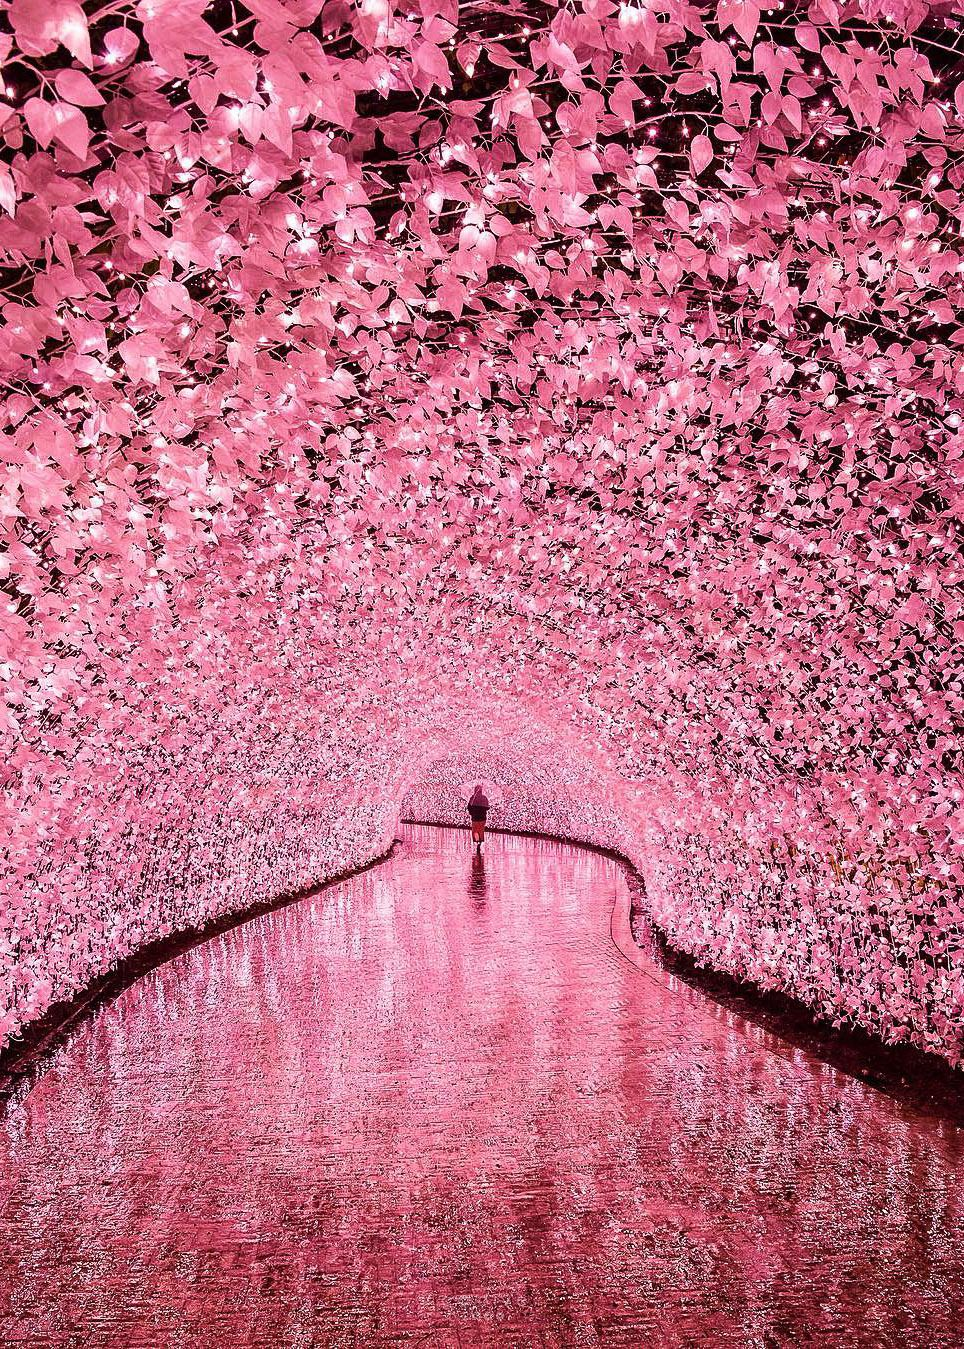 Colour My World Cherry Blossom Japan Cherry Blossom Nabana No Sato